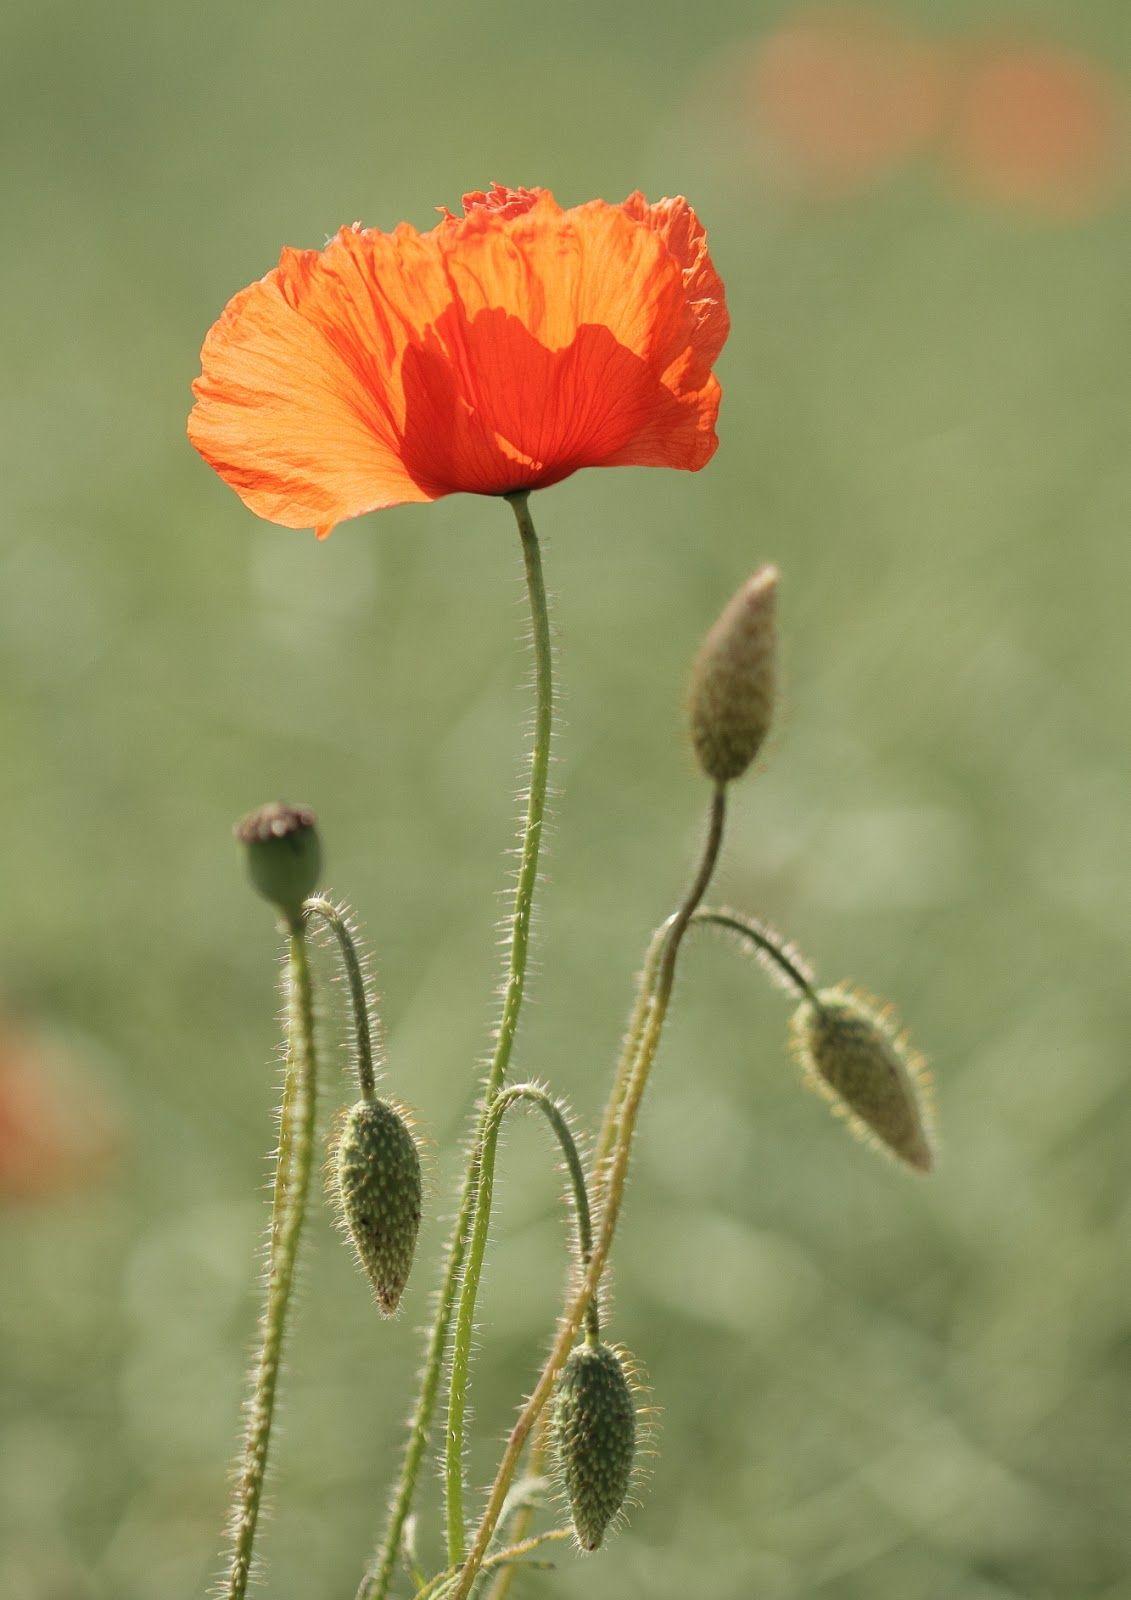 Single Poppy Flower Google Search Ceramics Pinterest